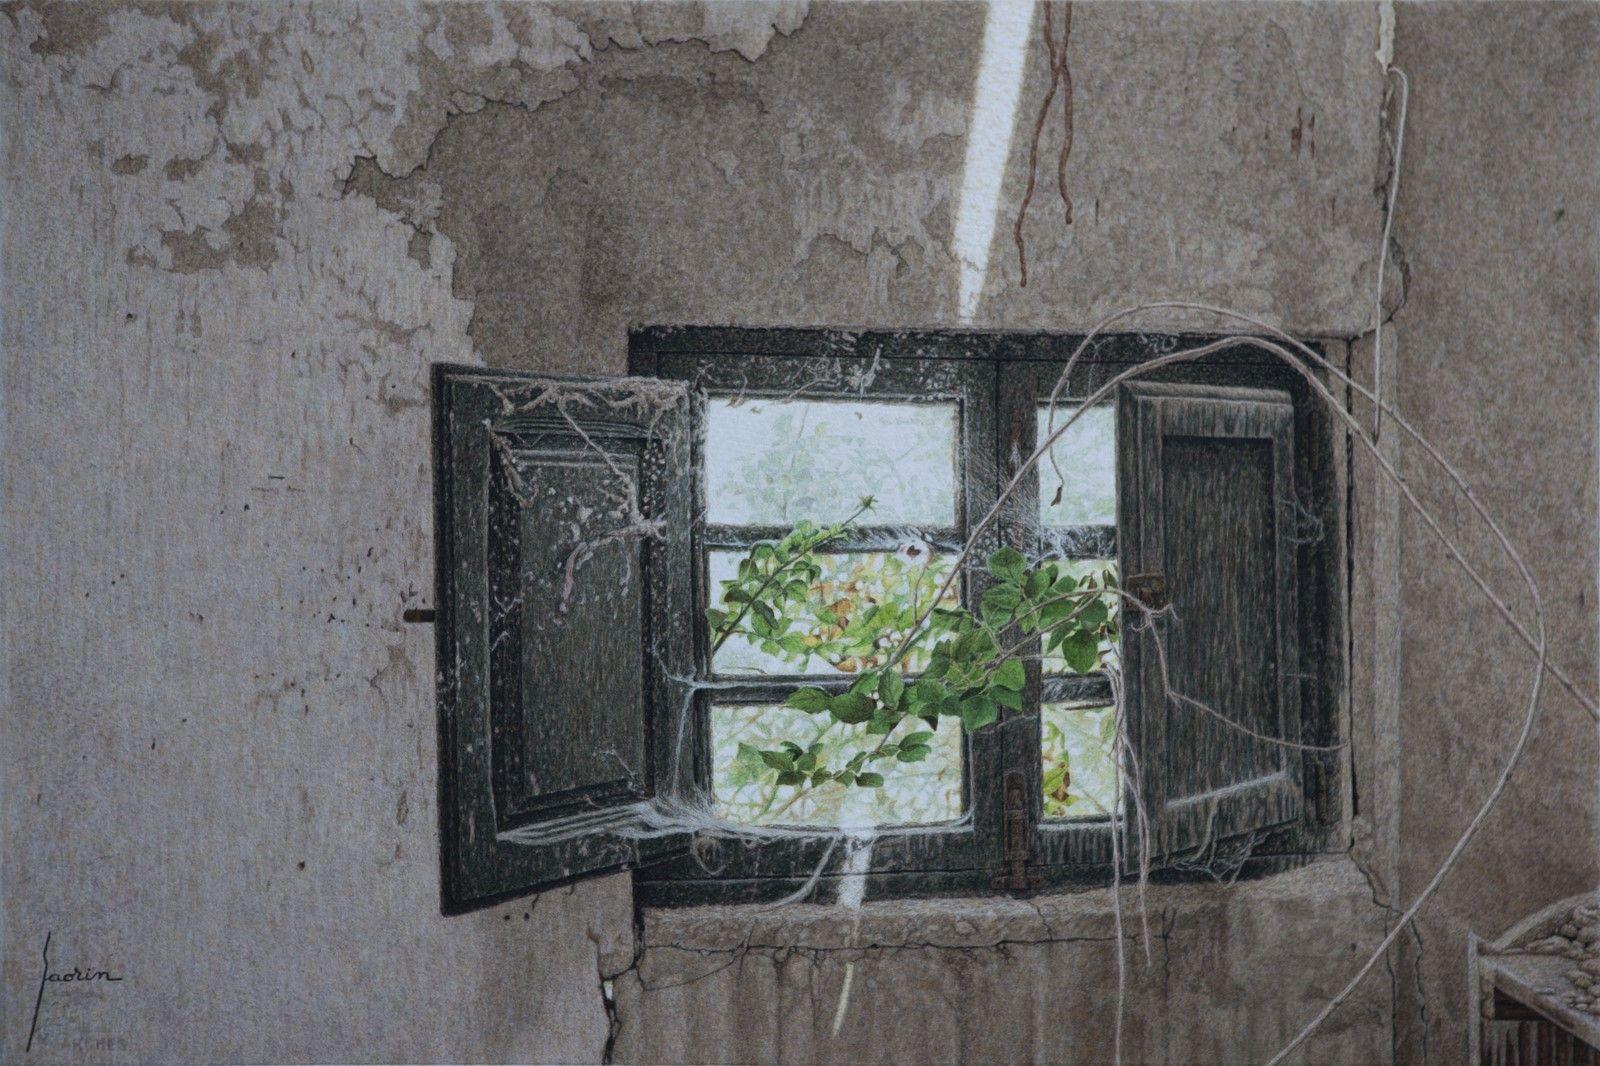 Autor: Jesús Lozano Saorin Titulo/title: Espinas en la ventana  Tamaño/size: 37,6x56,3 cm. Técnica/technics: Acuarela / Watercolor